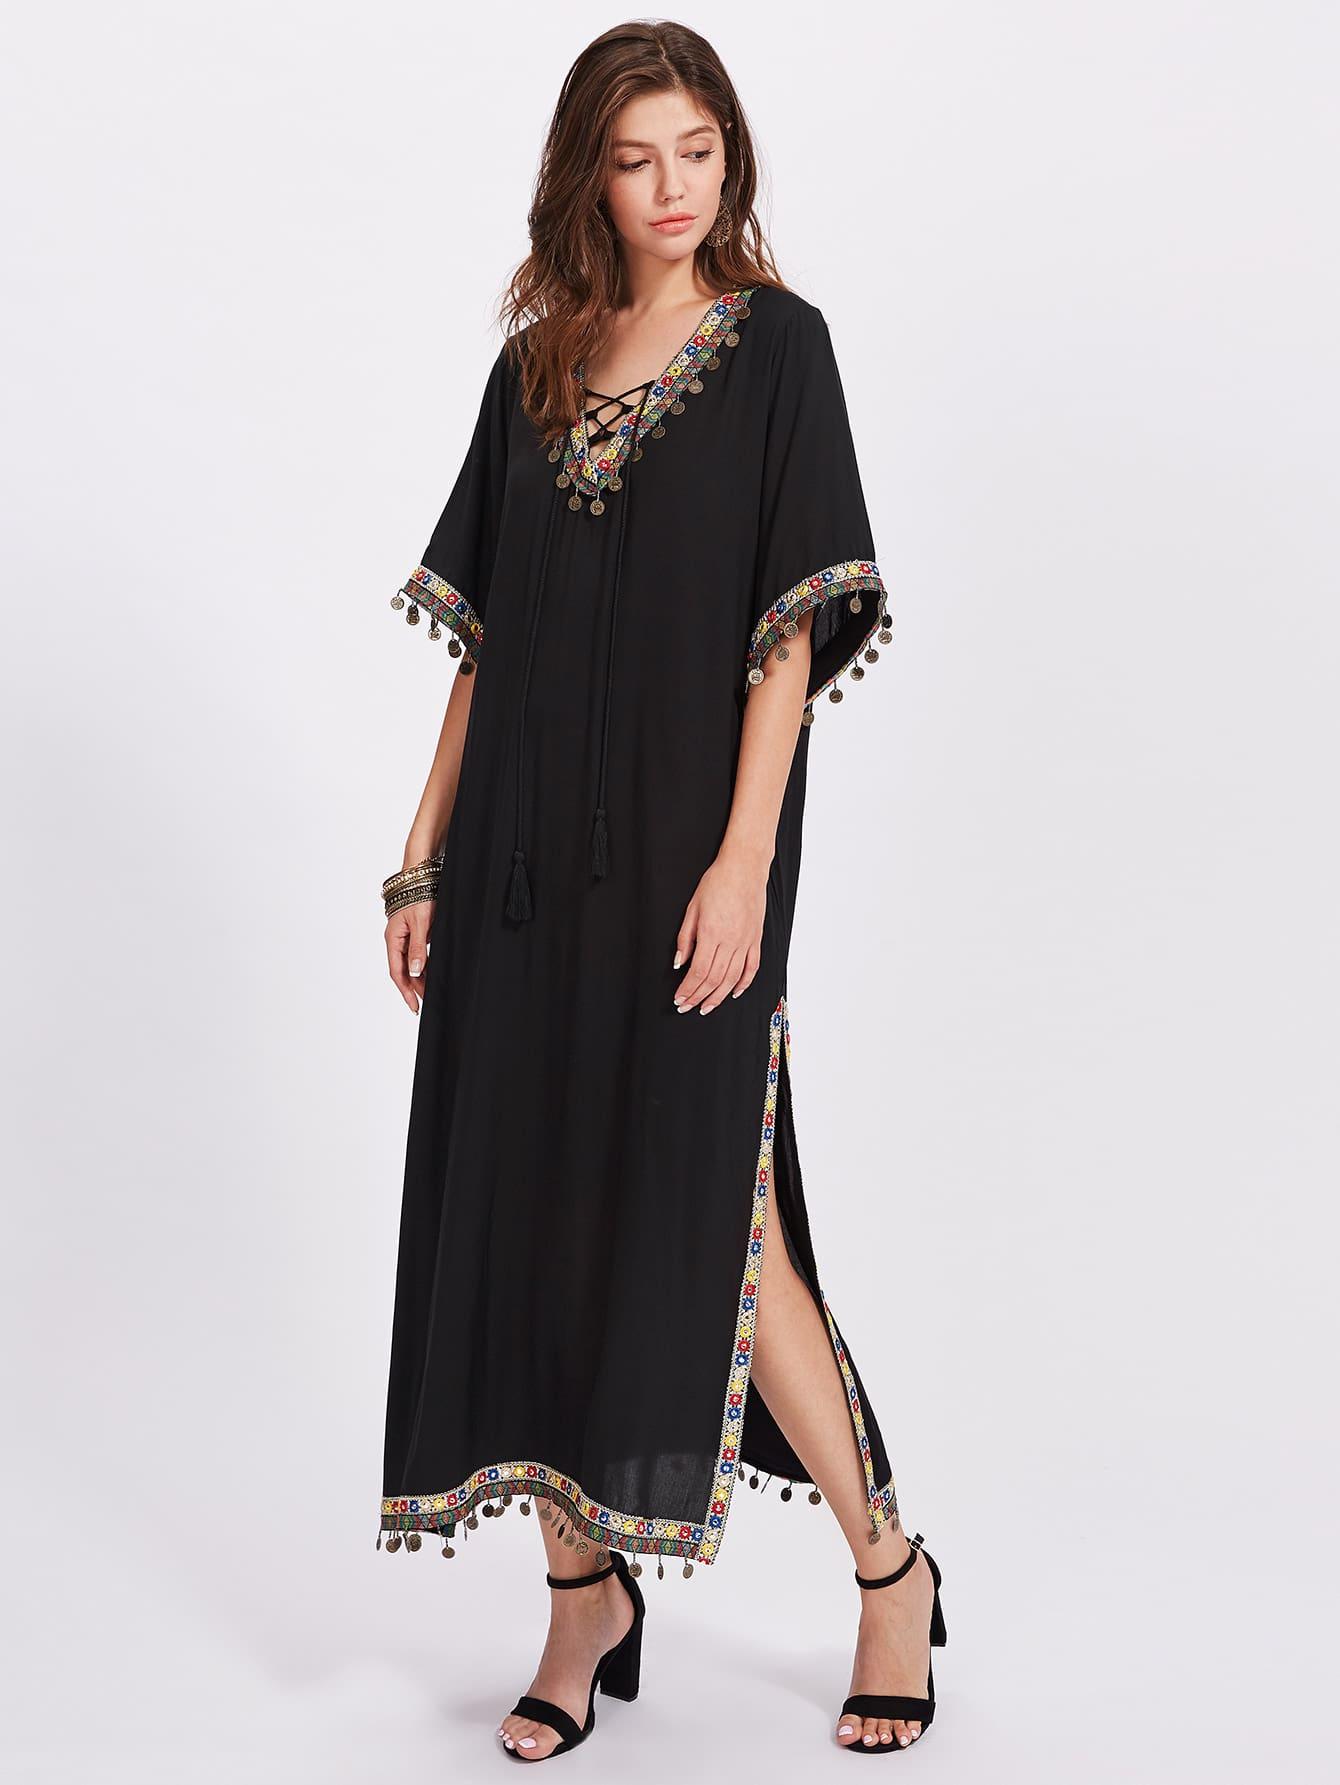 Embroidered Tape And Coin Fringe Trim Side Slit Dress dress170720452